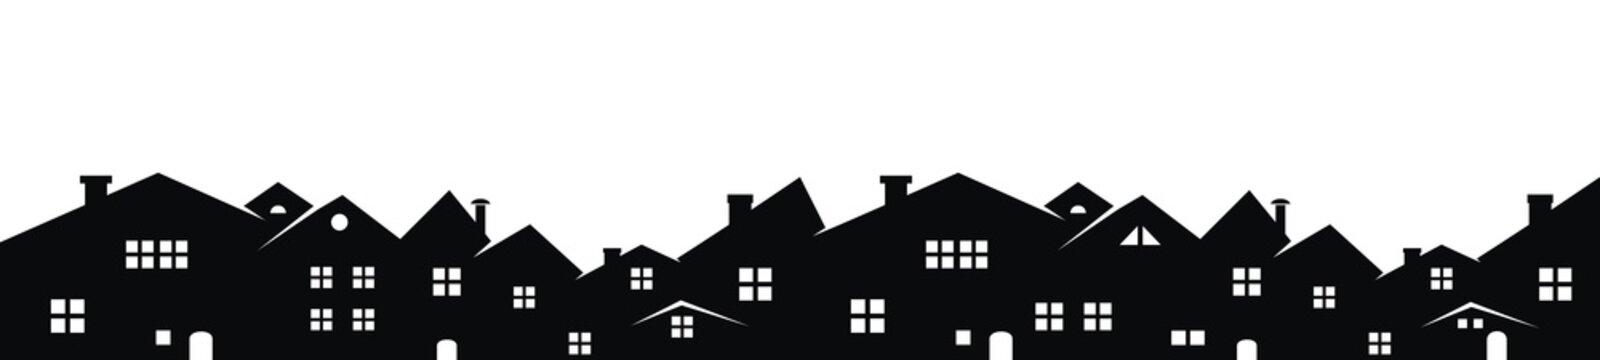 Cityscape, vector background, black silhouette